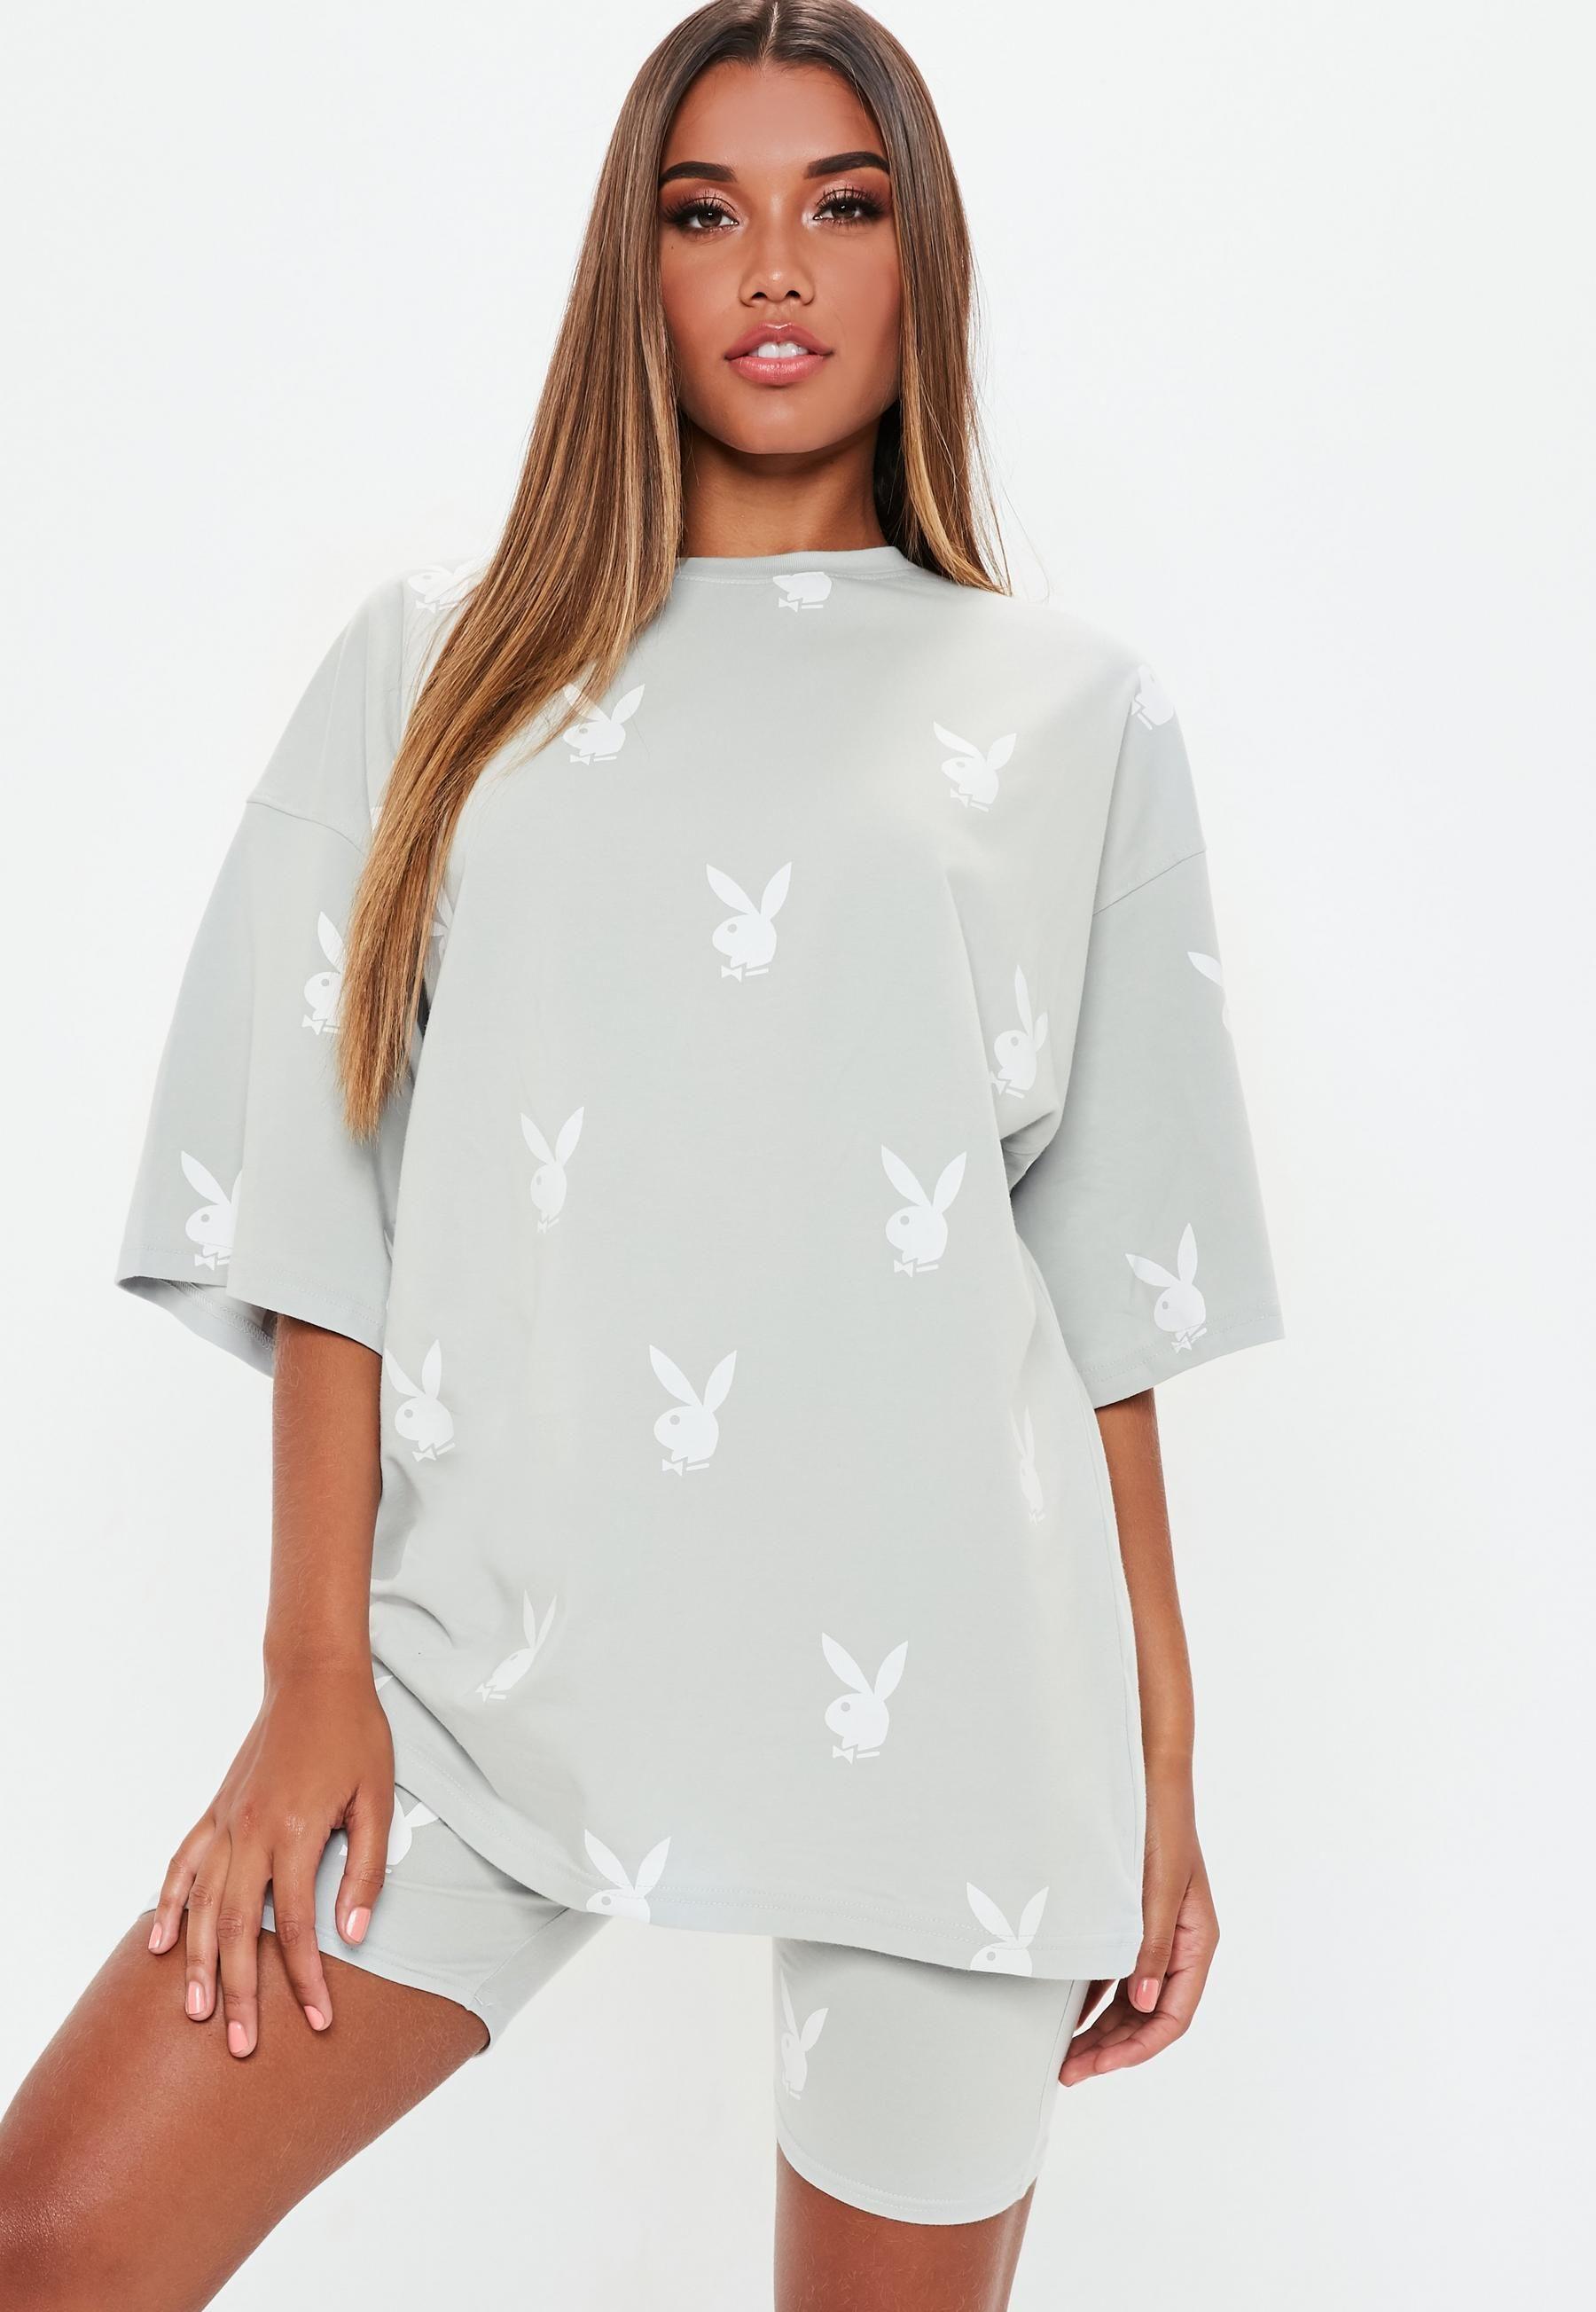 8f431fda74ead Playboy x Missguided Grey Repeat Print Oversized T-Shirt